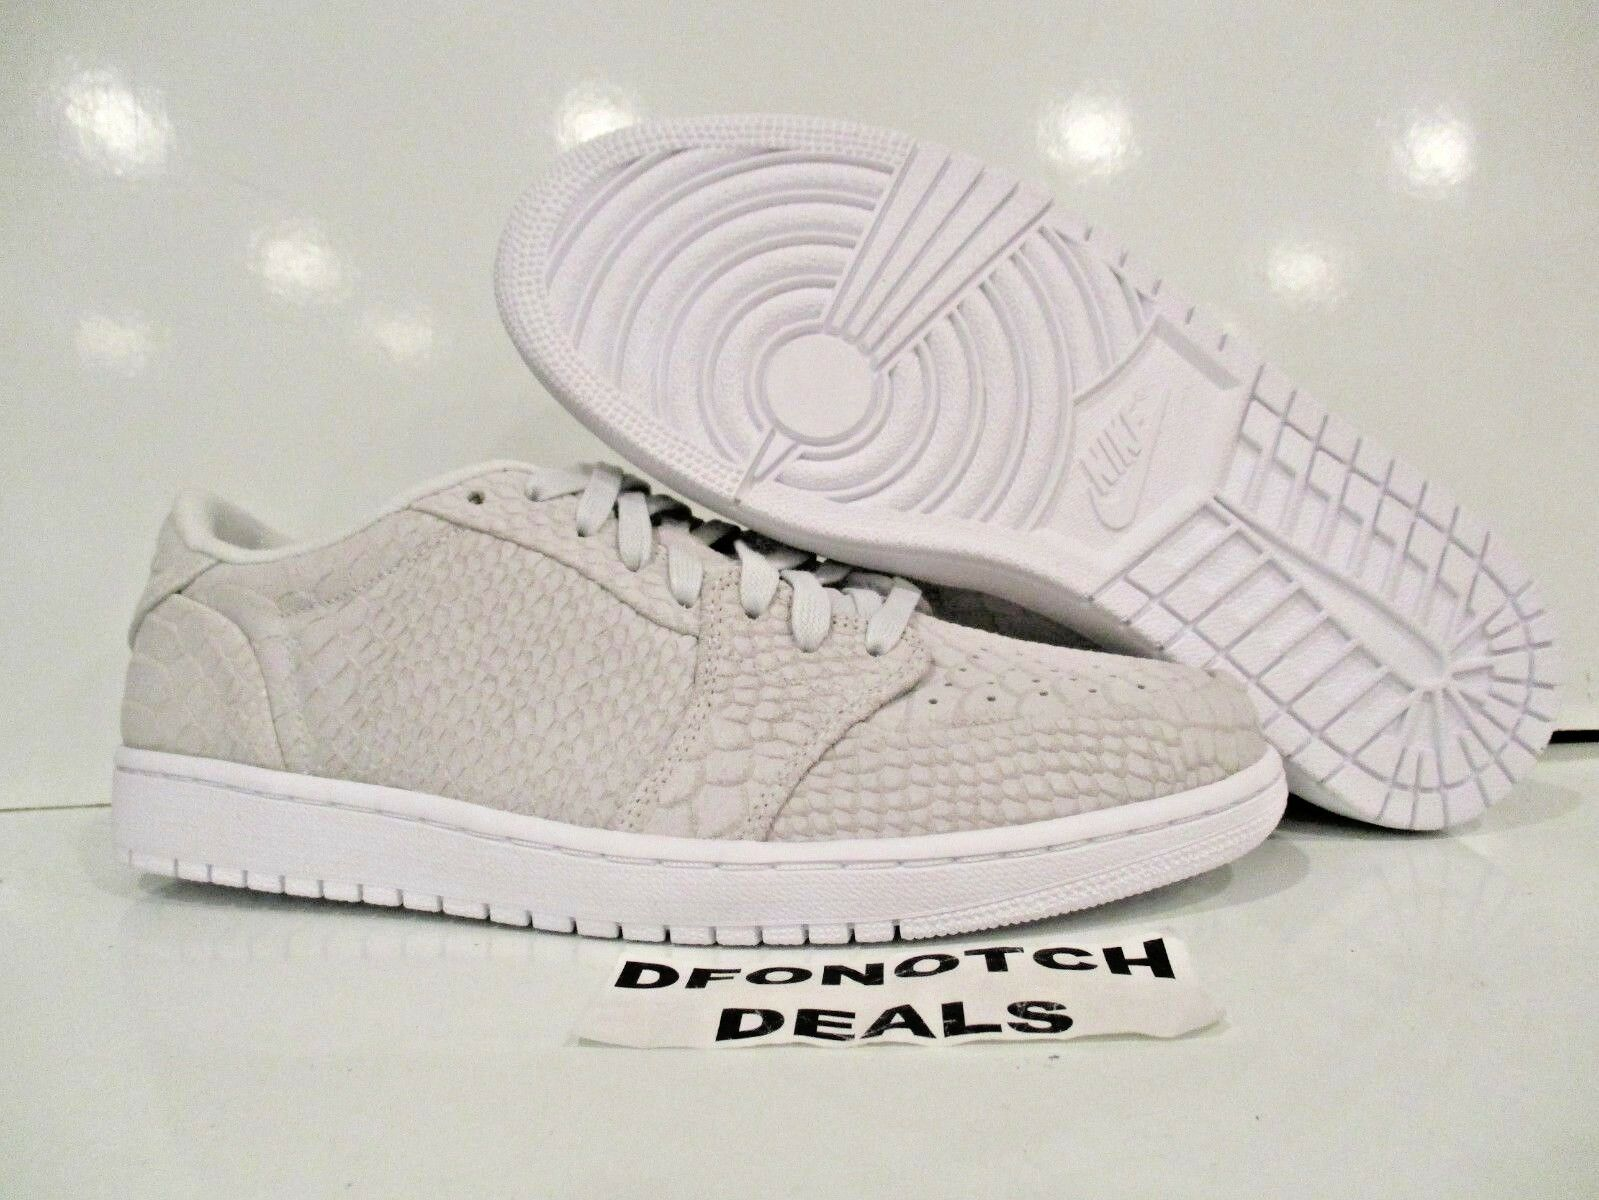 Nike Air Jordan 1 Retro Low NS Men's Sz 10.5 Off White 872782-111 NEW MSRP  150